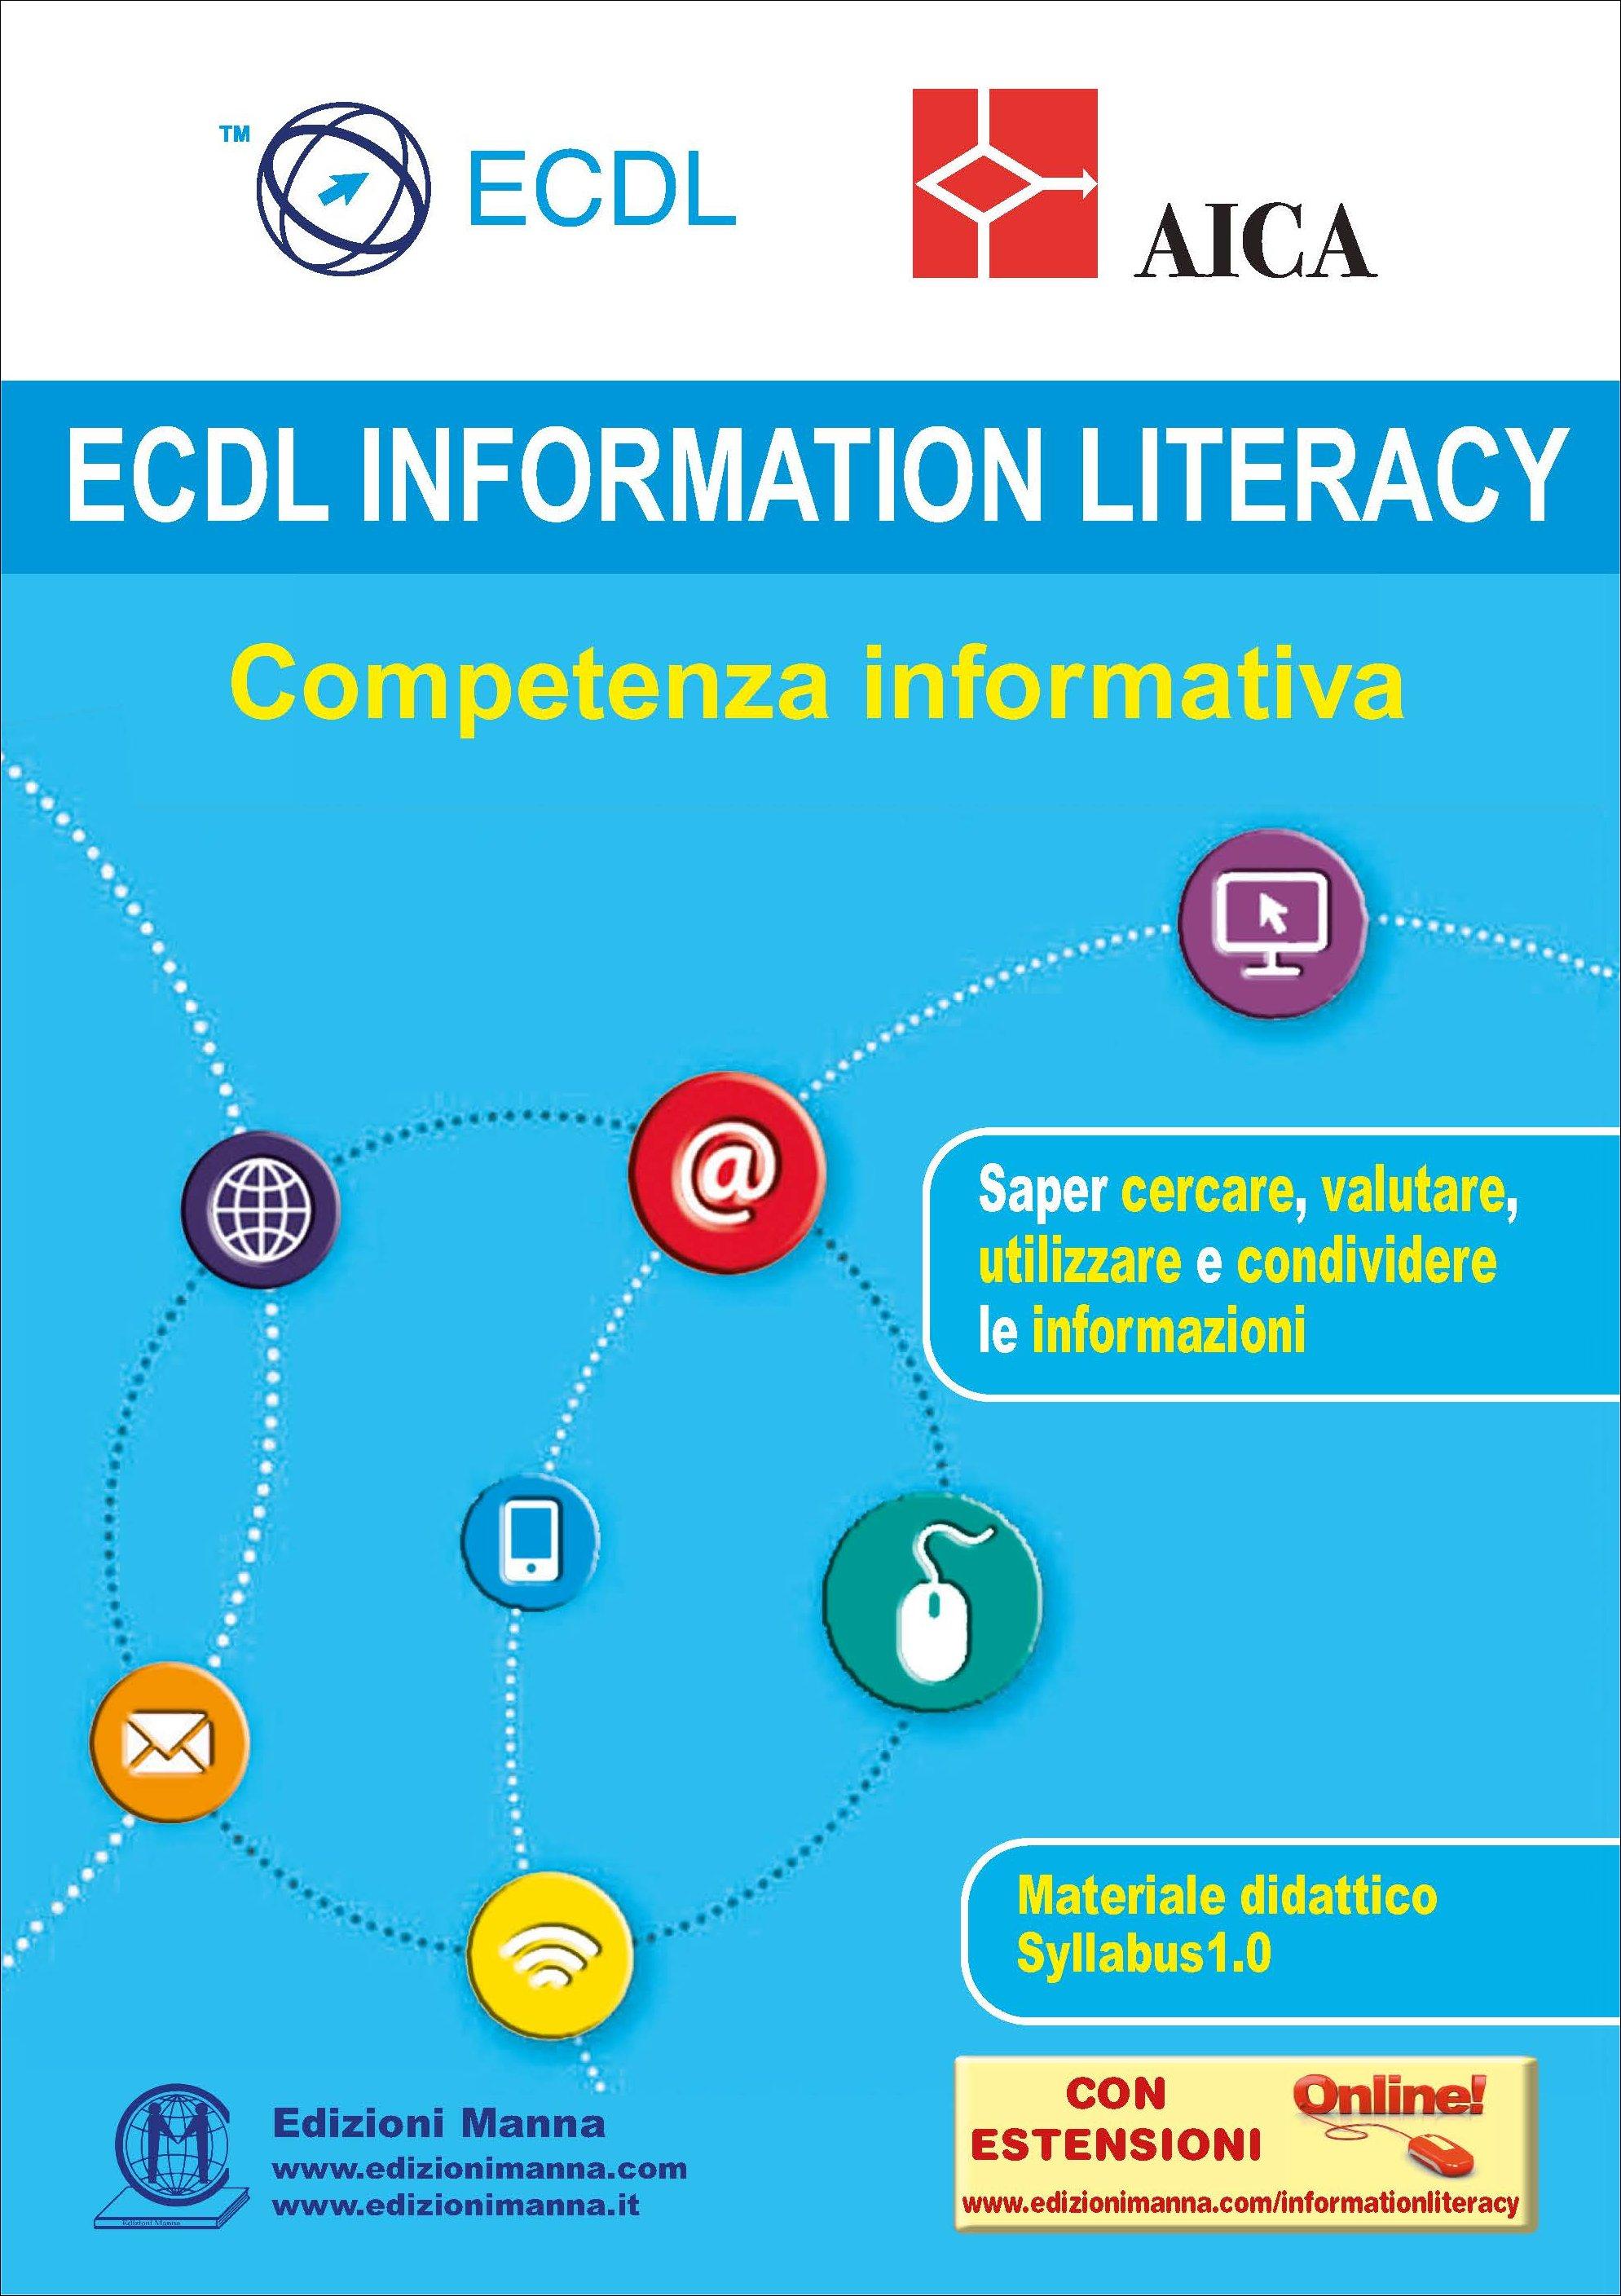 copertina-ECDL-Information-Literacy